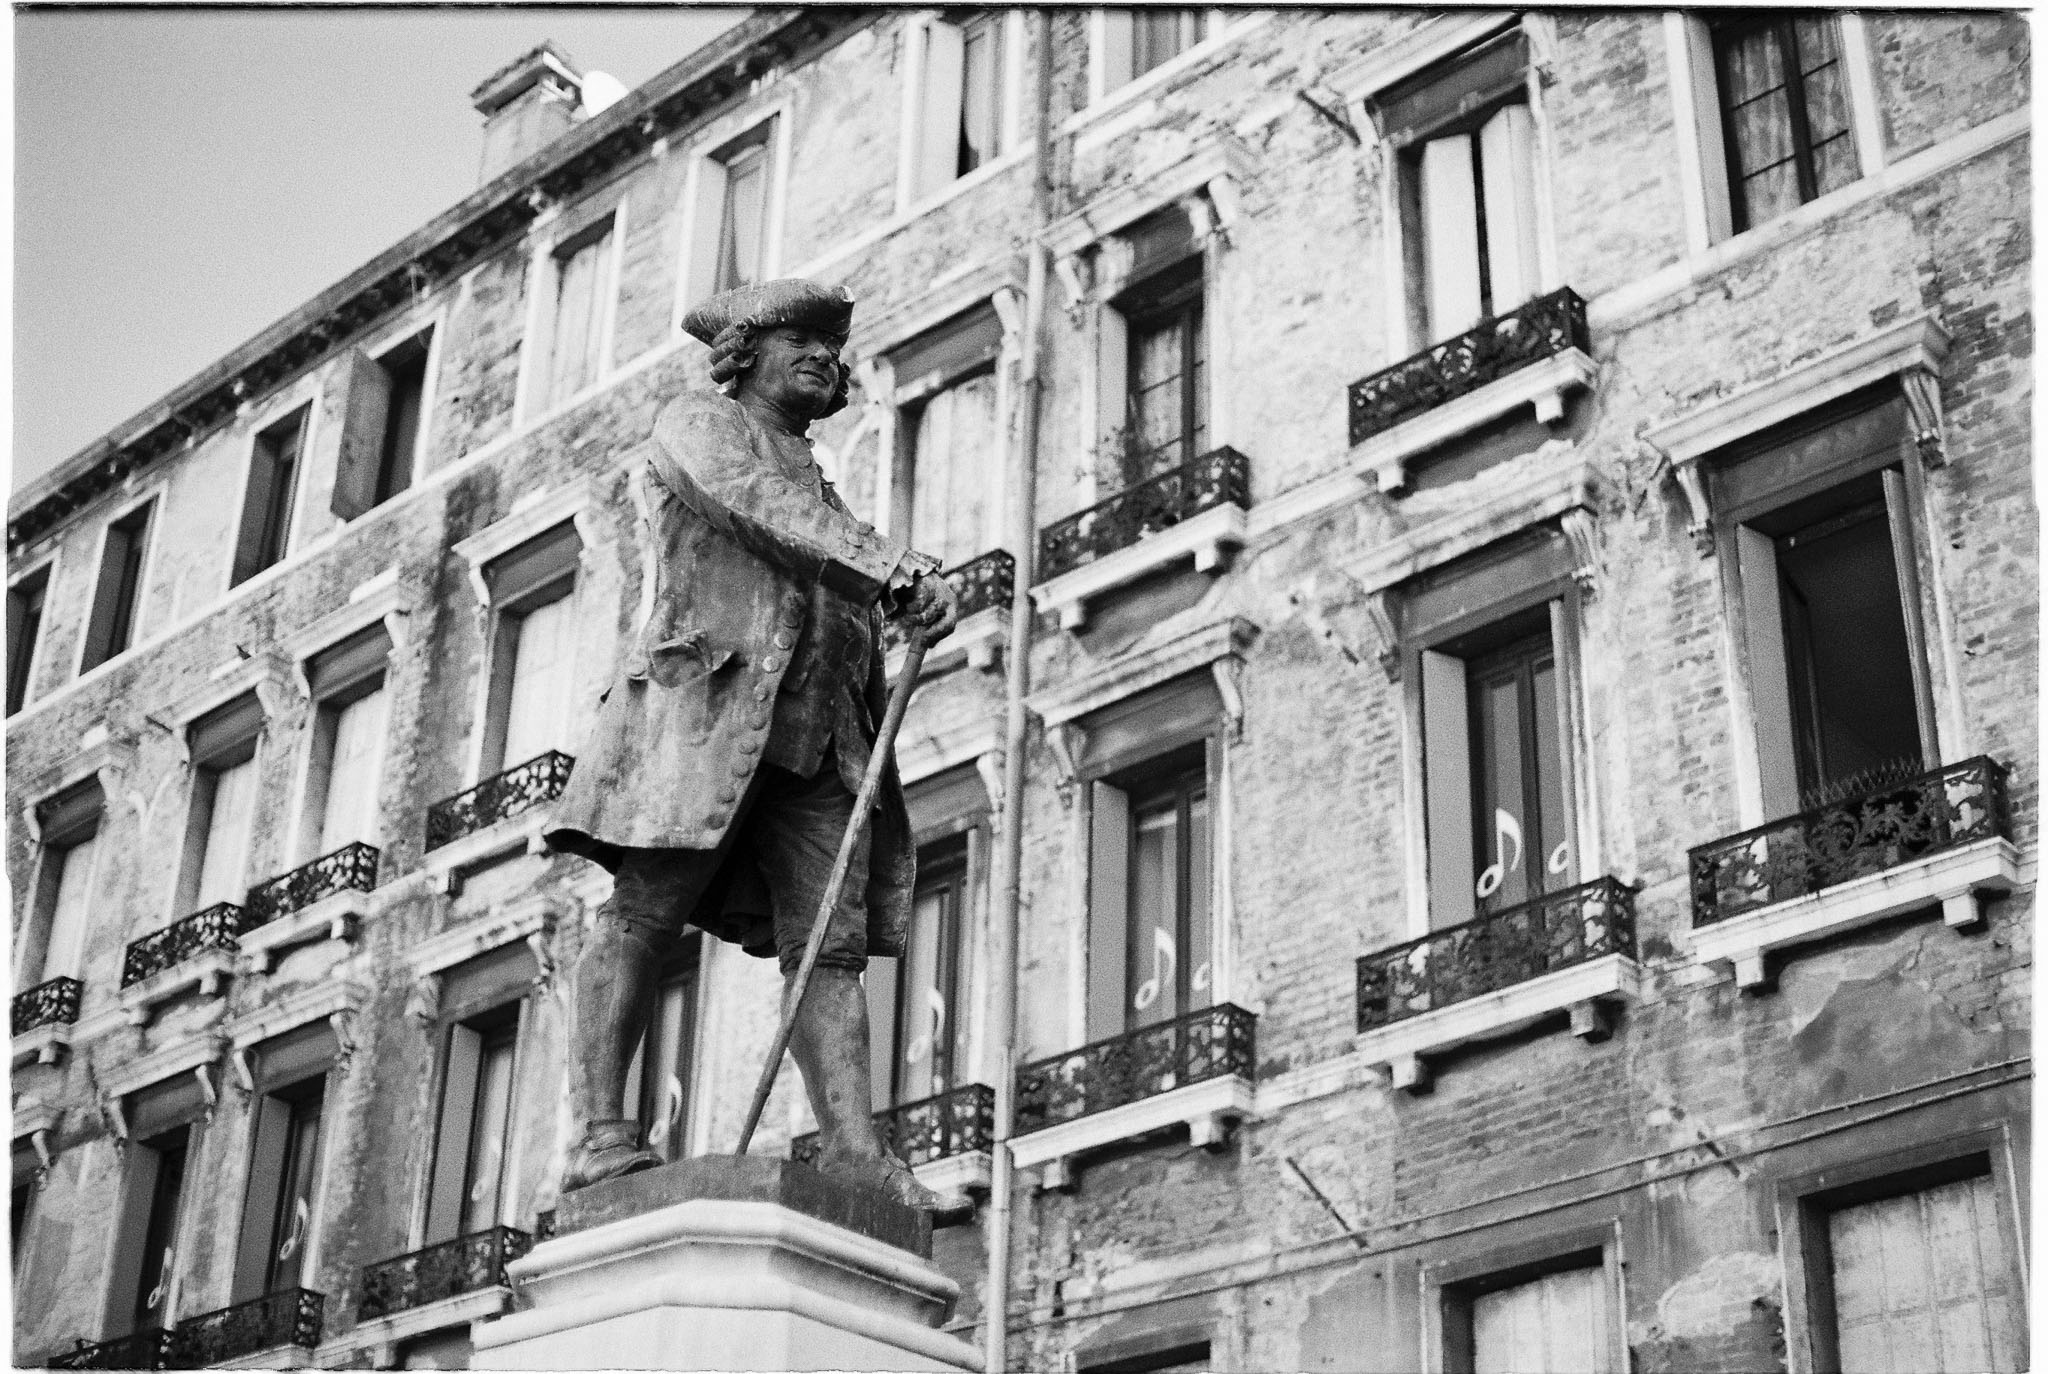 Venice statue analog film photography